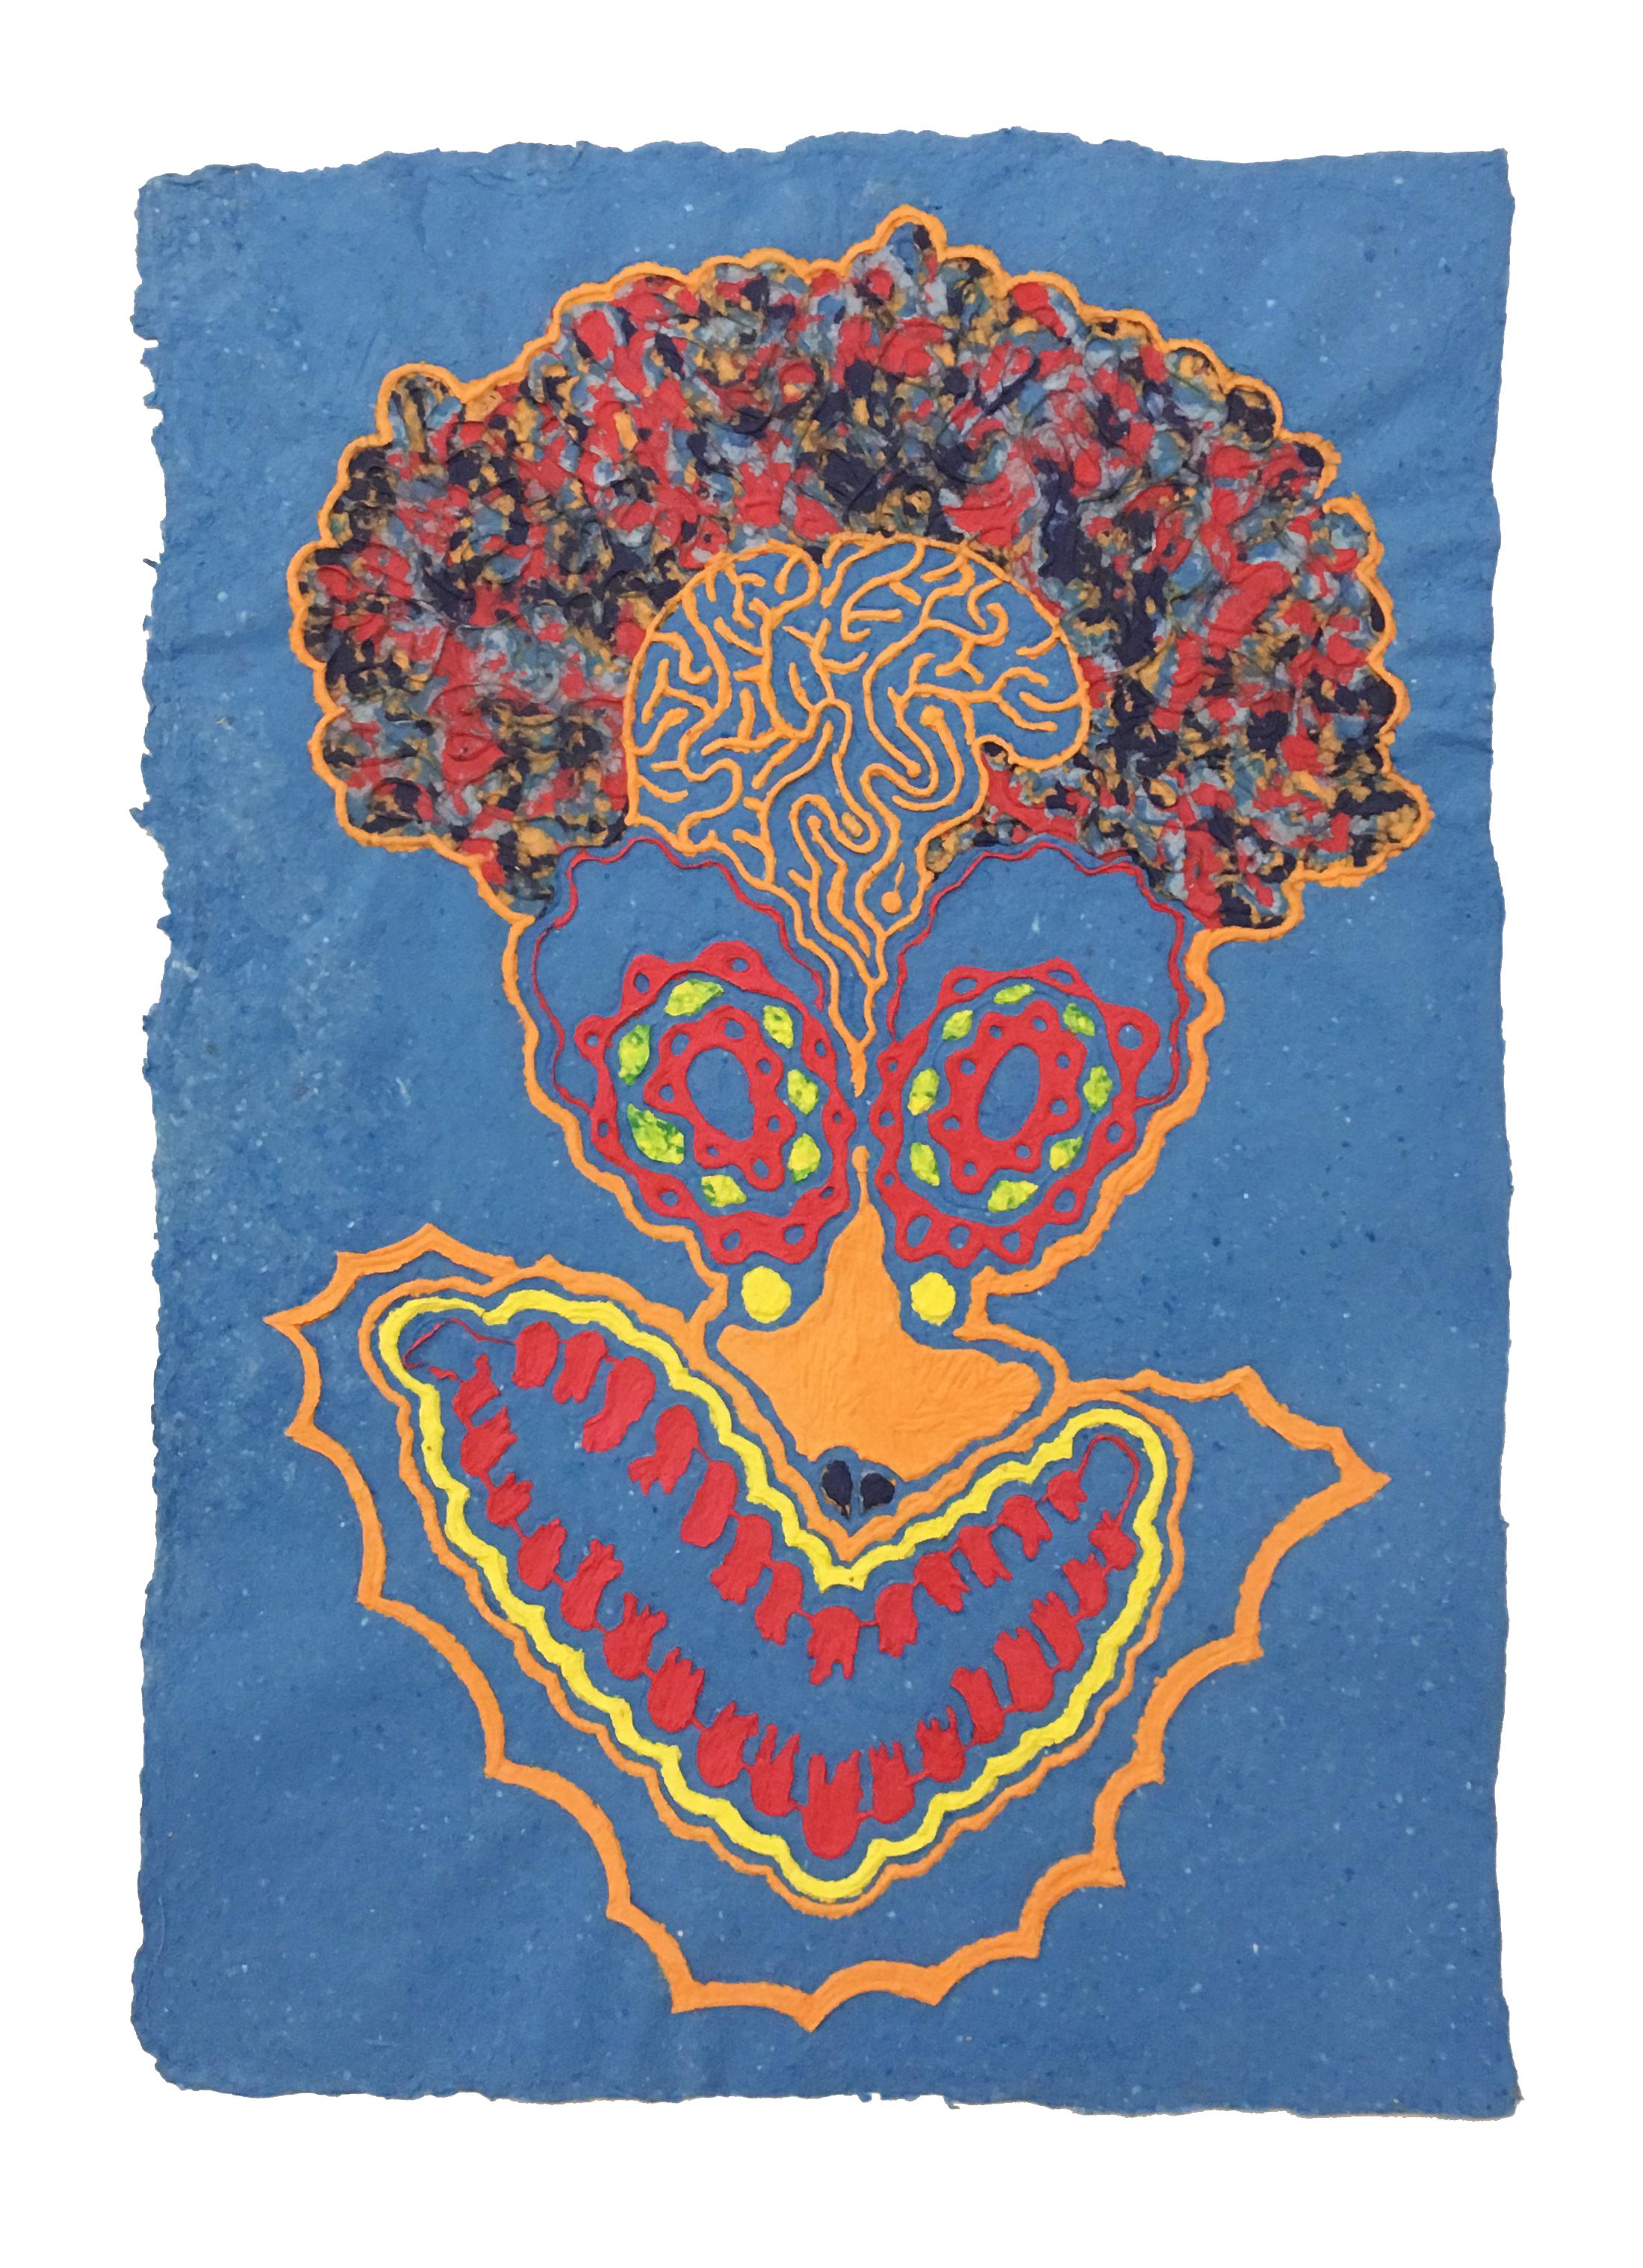 Daniel Wiener   Take the Brain Out of My Skull , 2017  Paper pulp